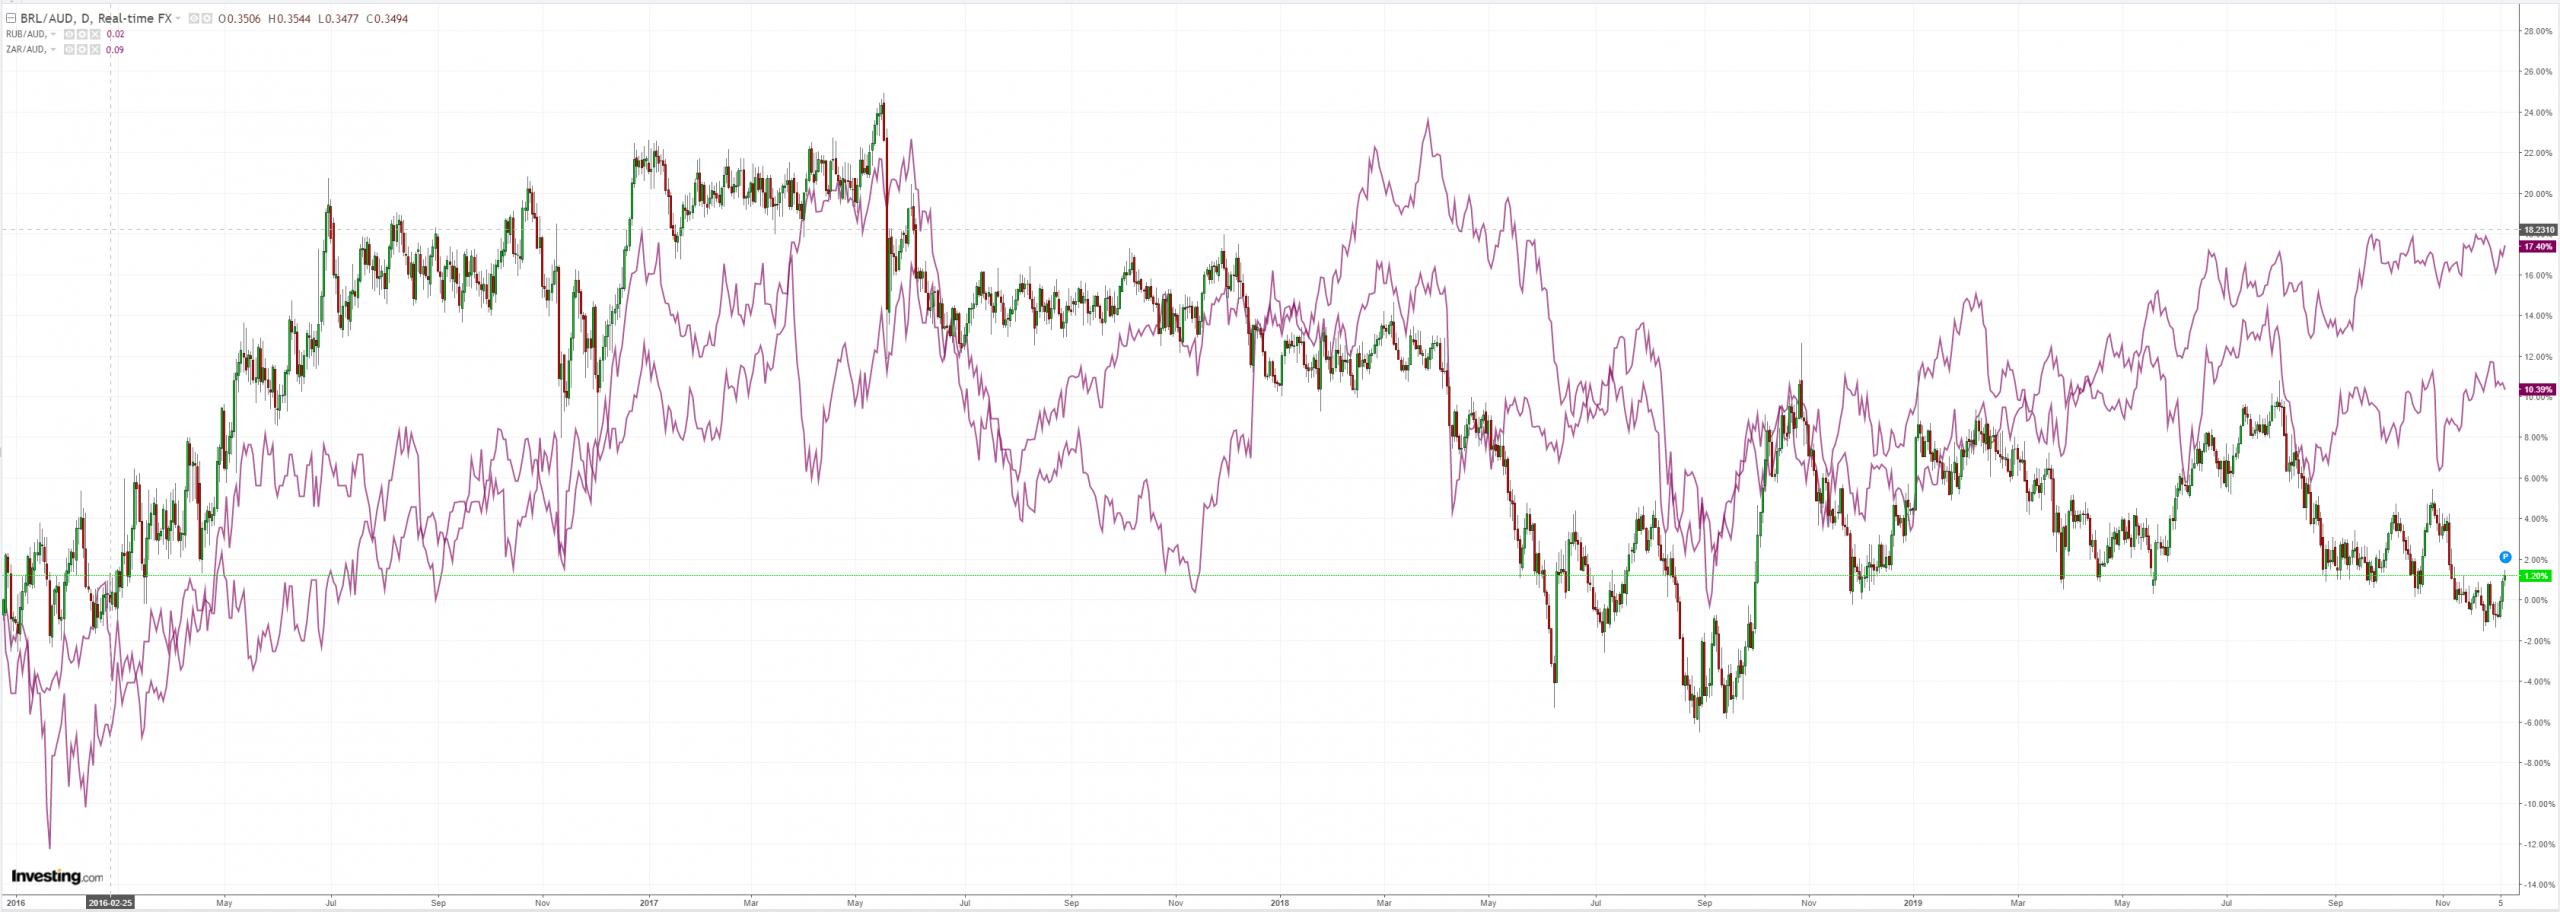 Australian dollar 2020 forecast: more falls - MacroBusiness